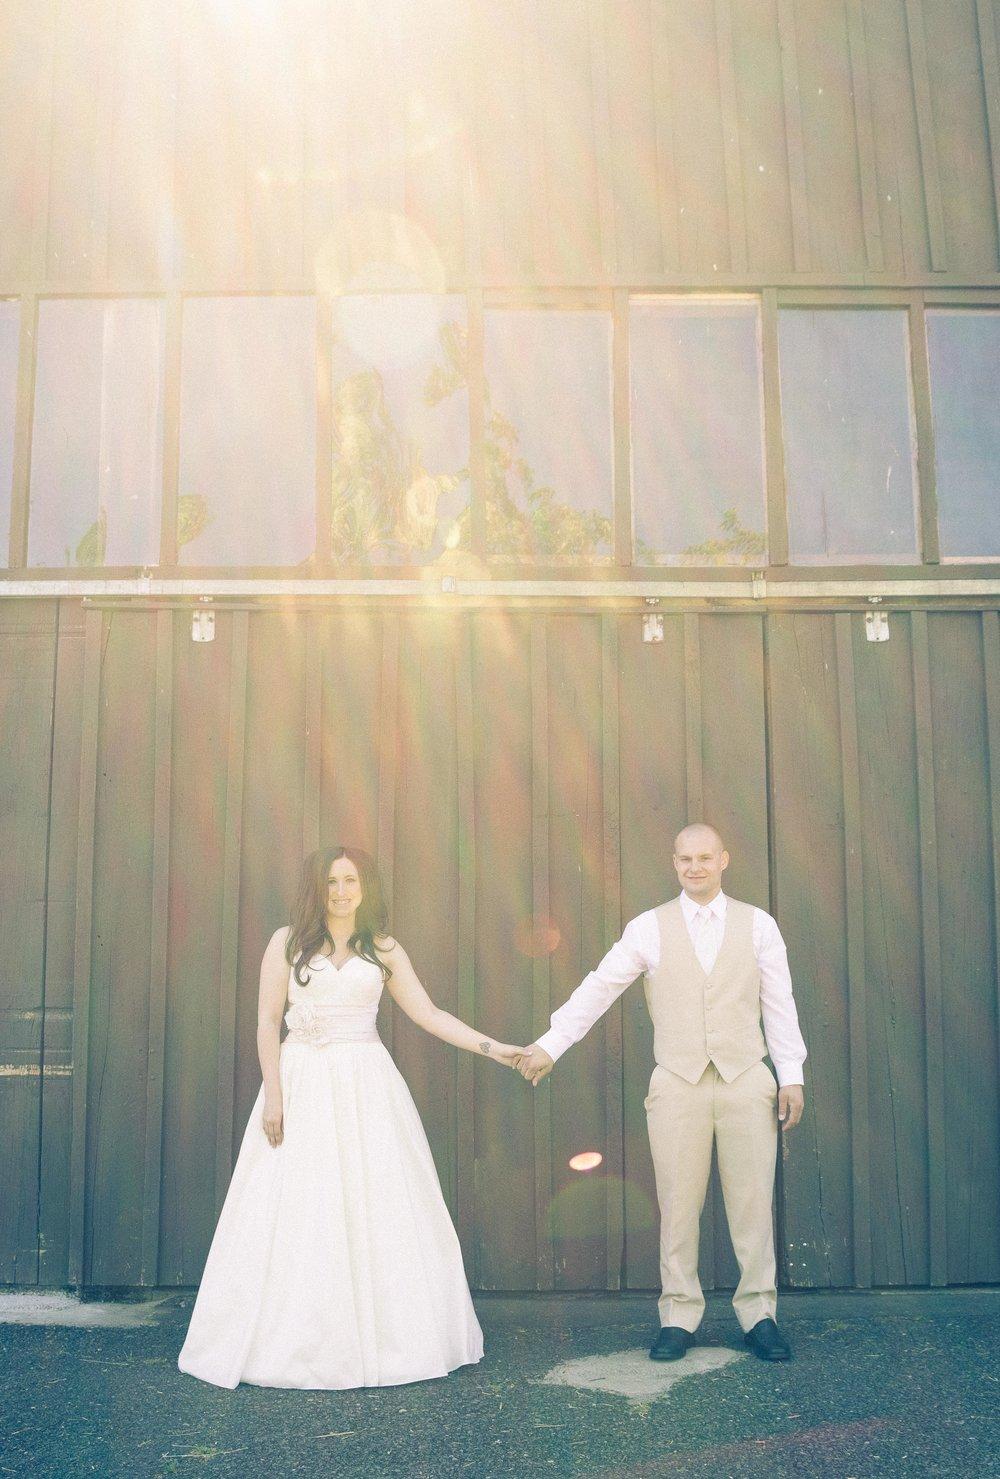 cf322-wedding-4.jpg